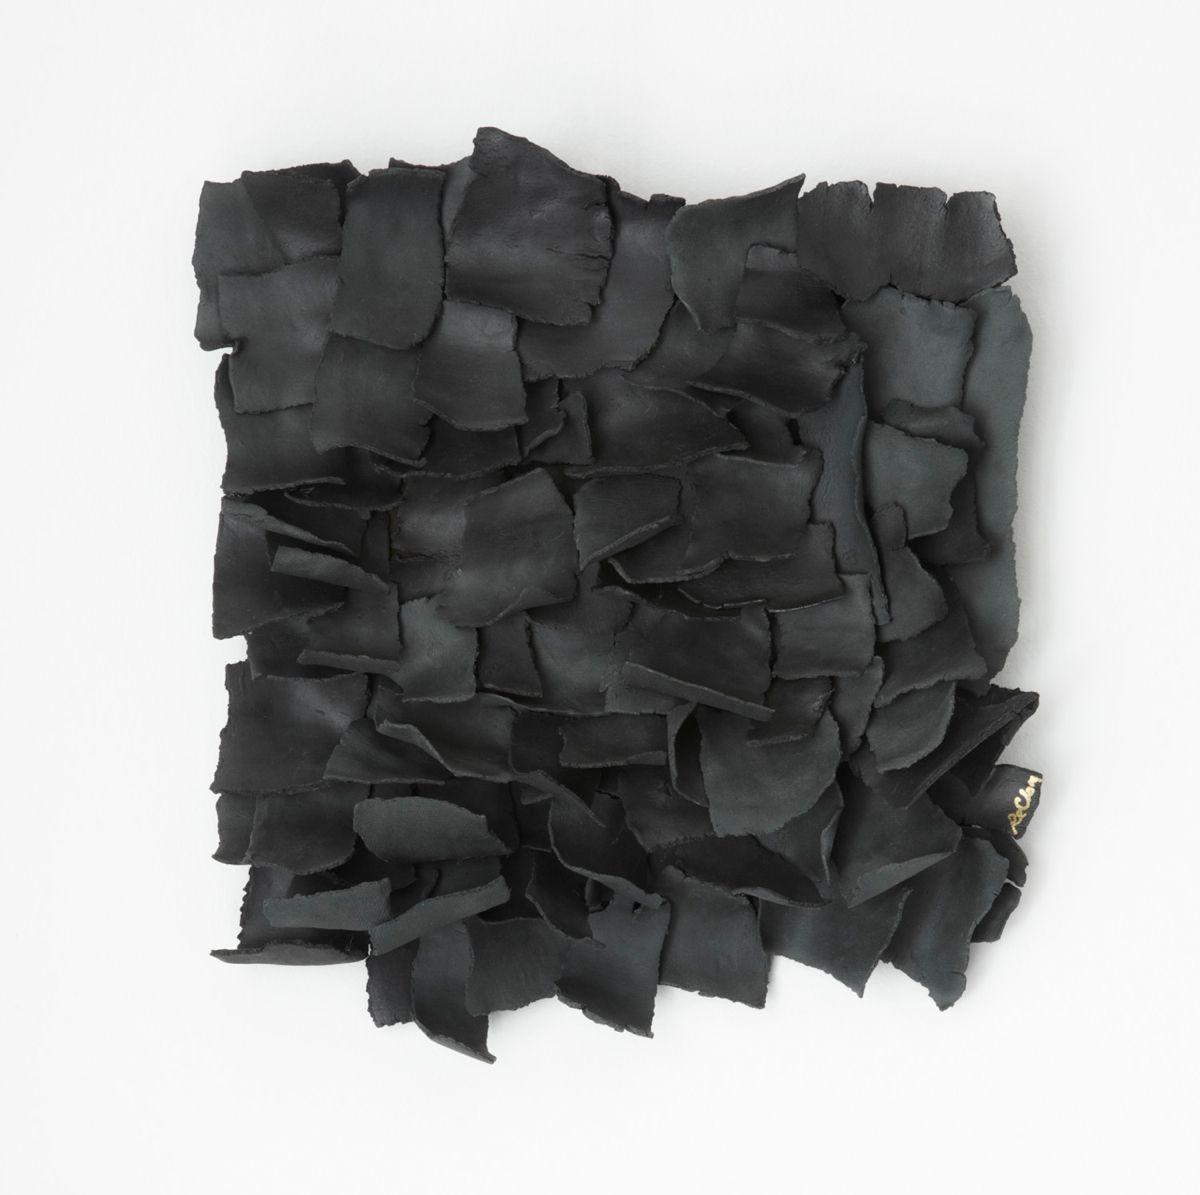 http://www.rechengtsang.com  frayed : charcoal